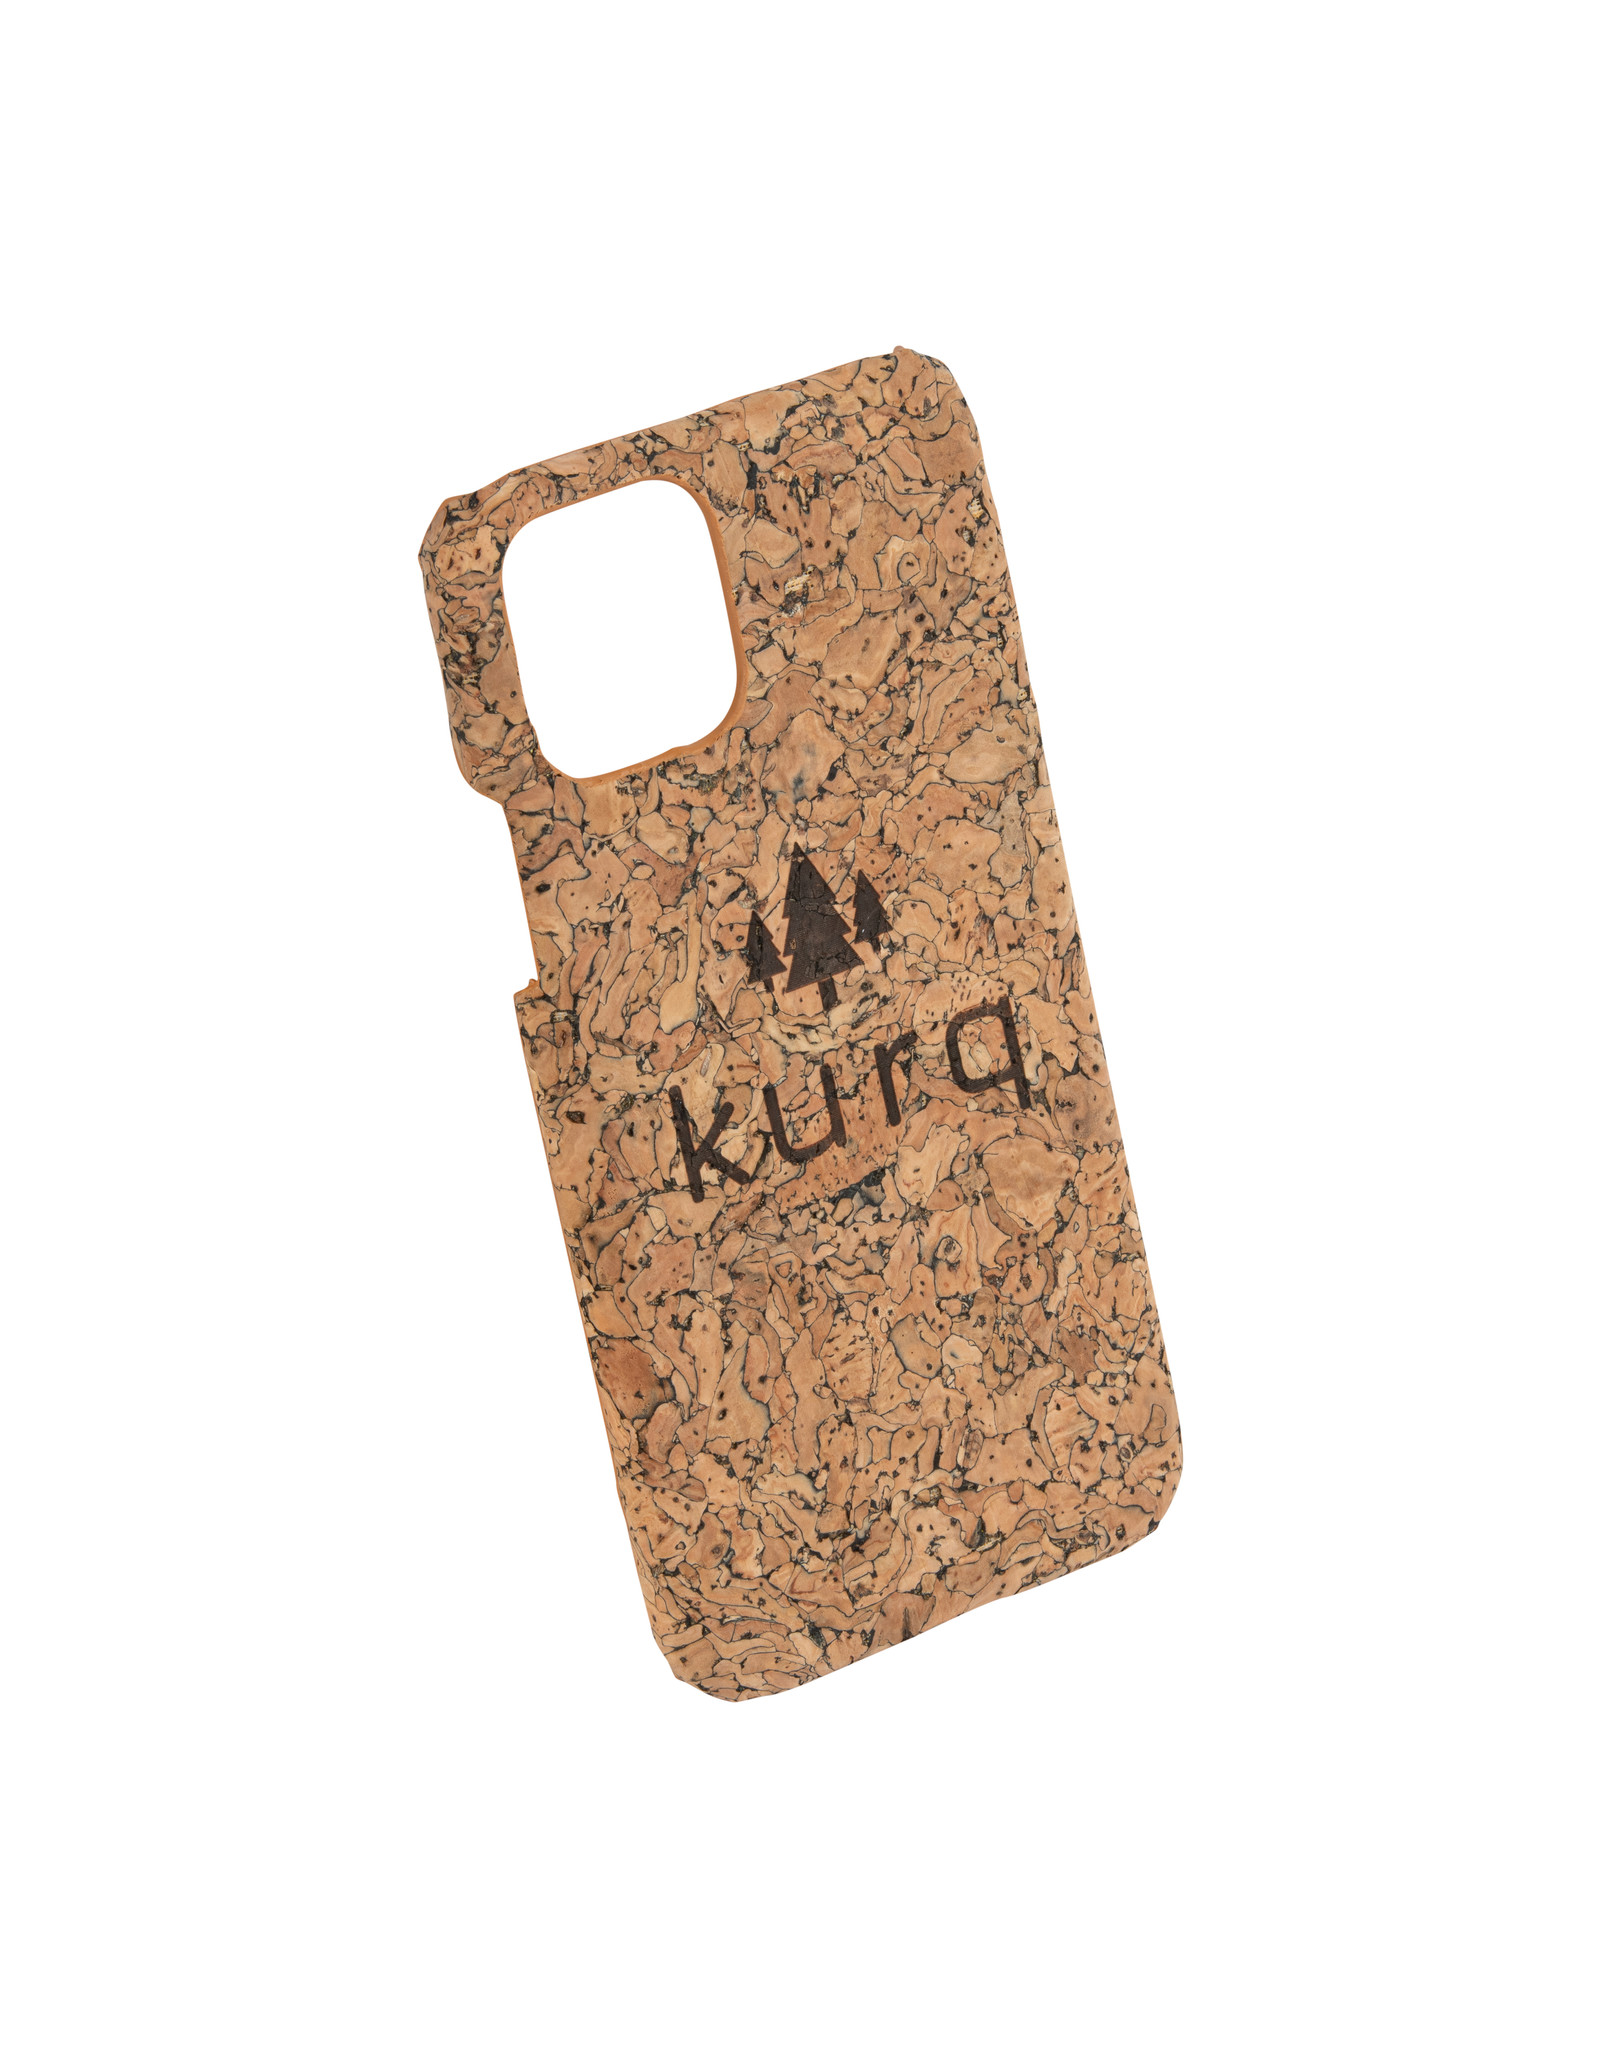 KURQ - Cork phone case for iPhone 11 Pro